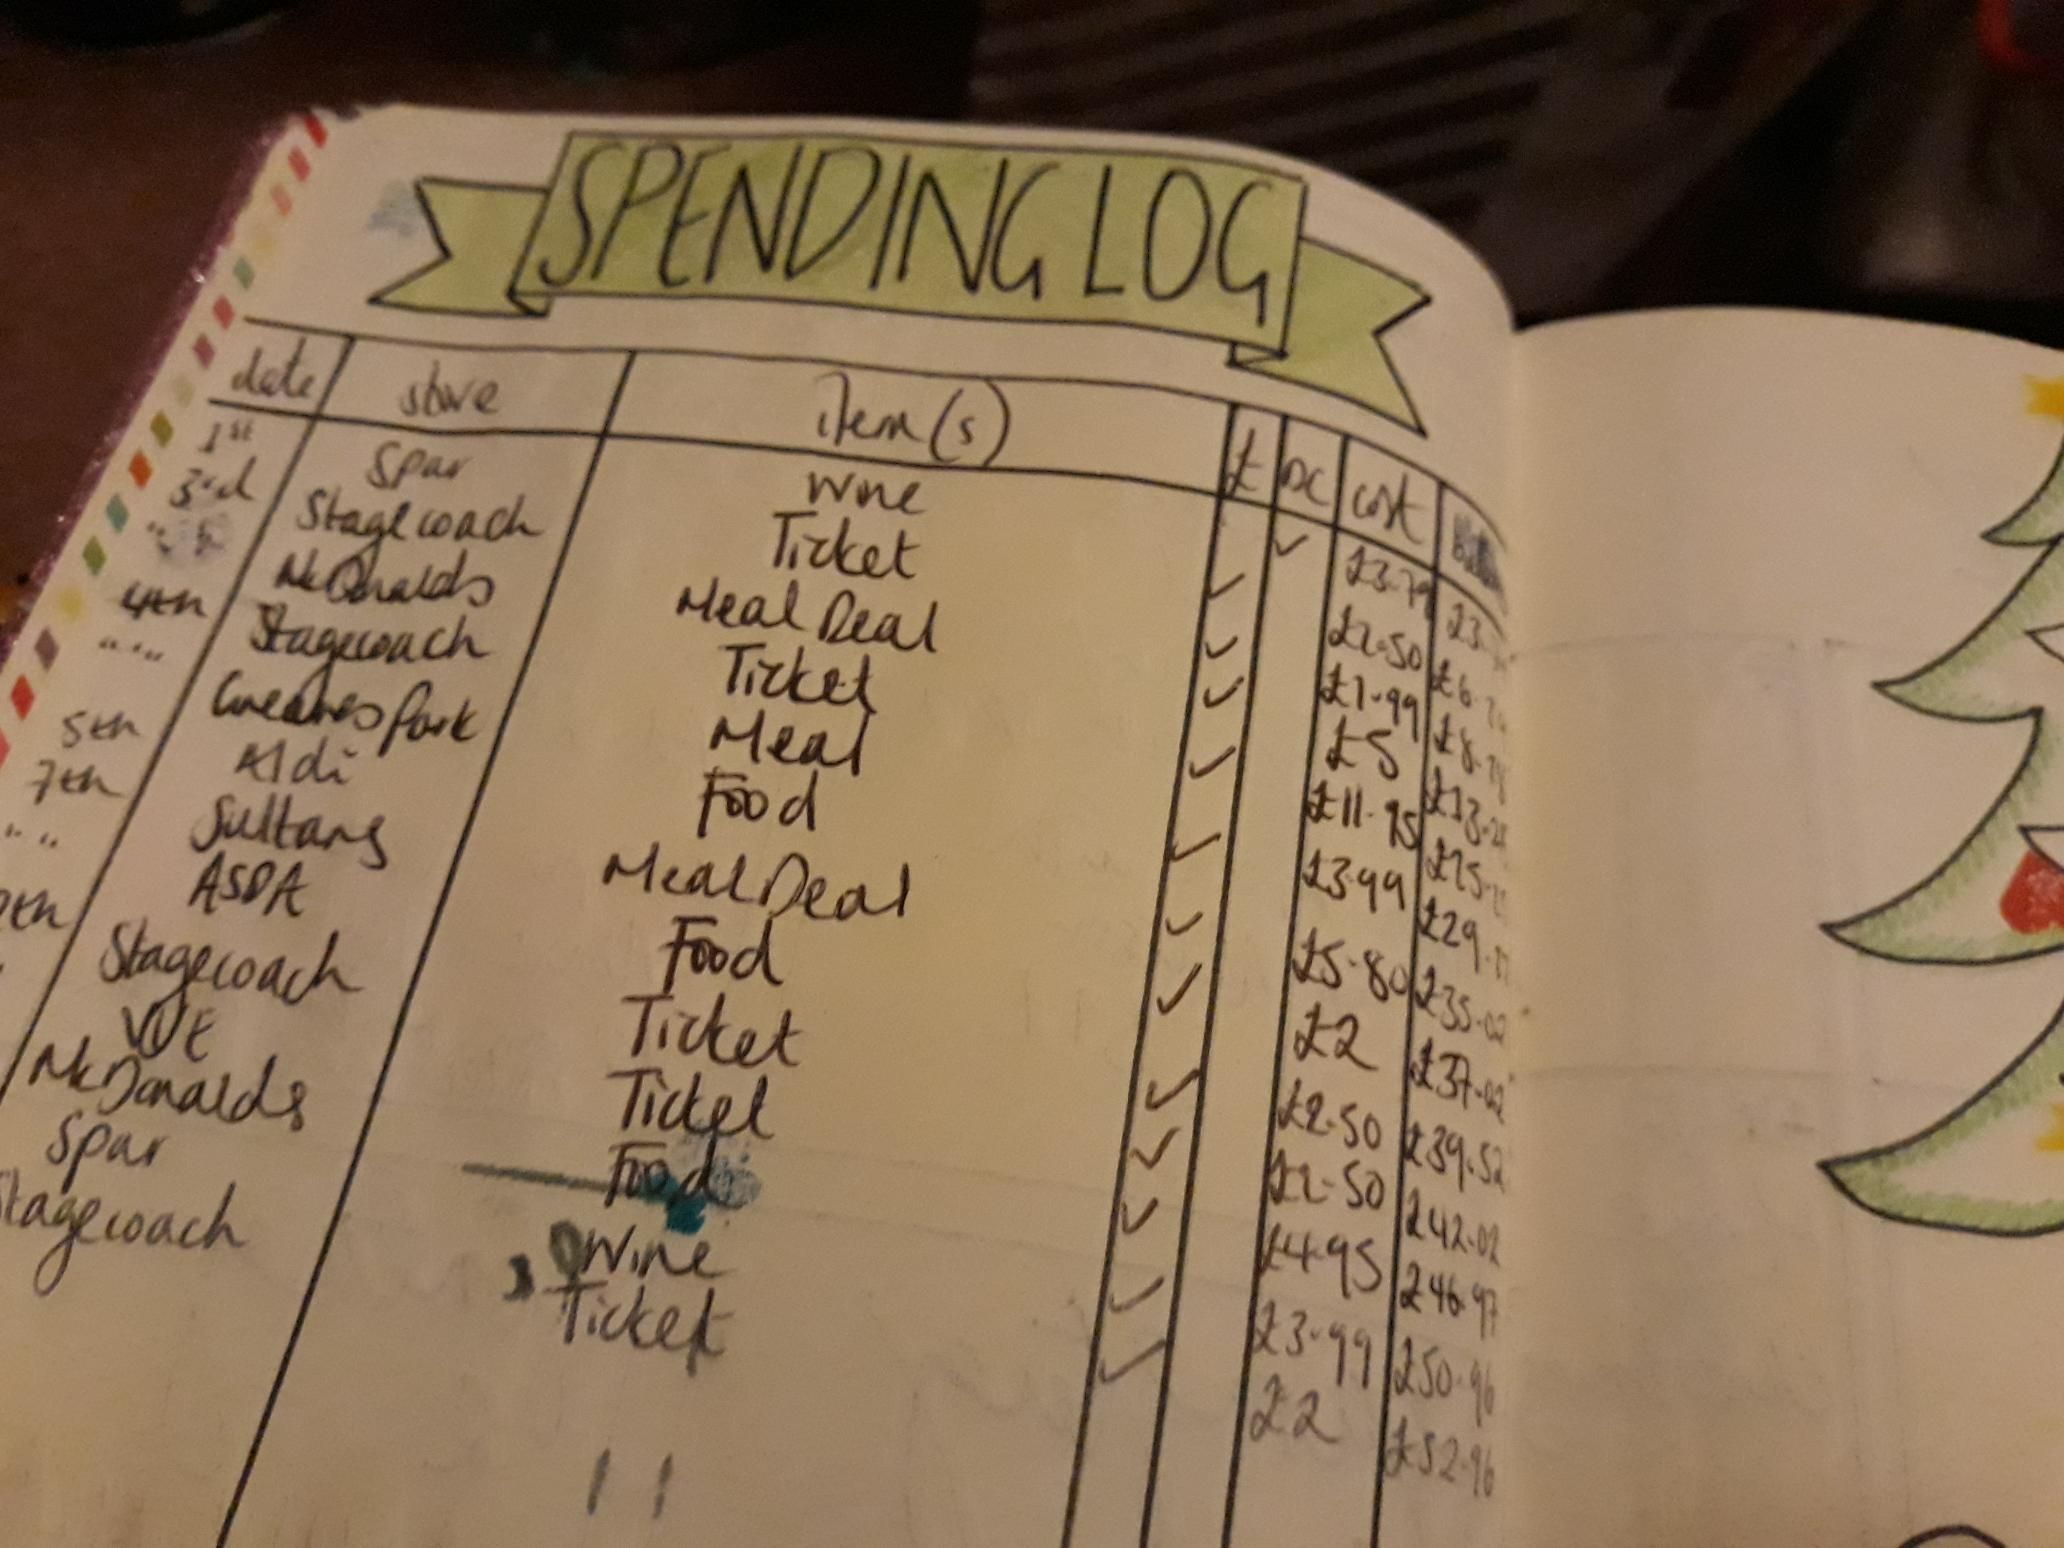 Image may contain: Handwriting, Text, Book